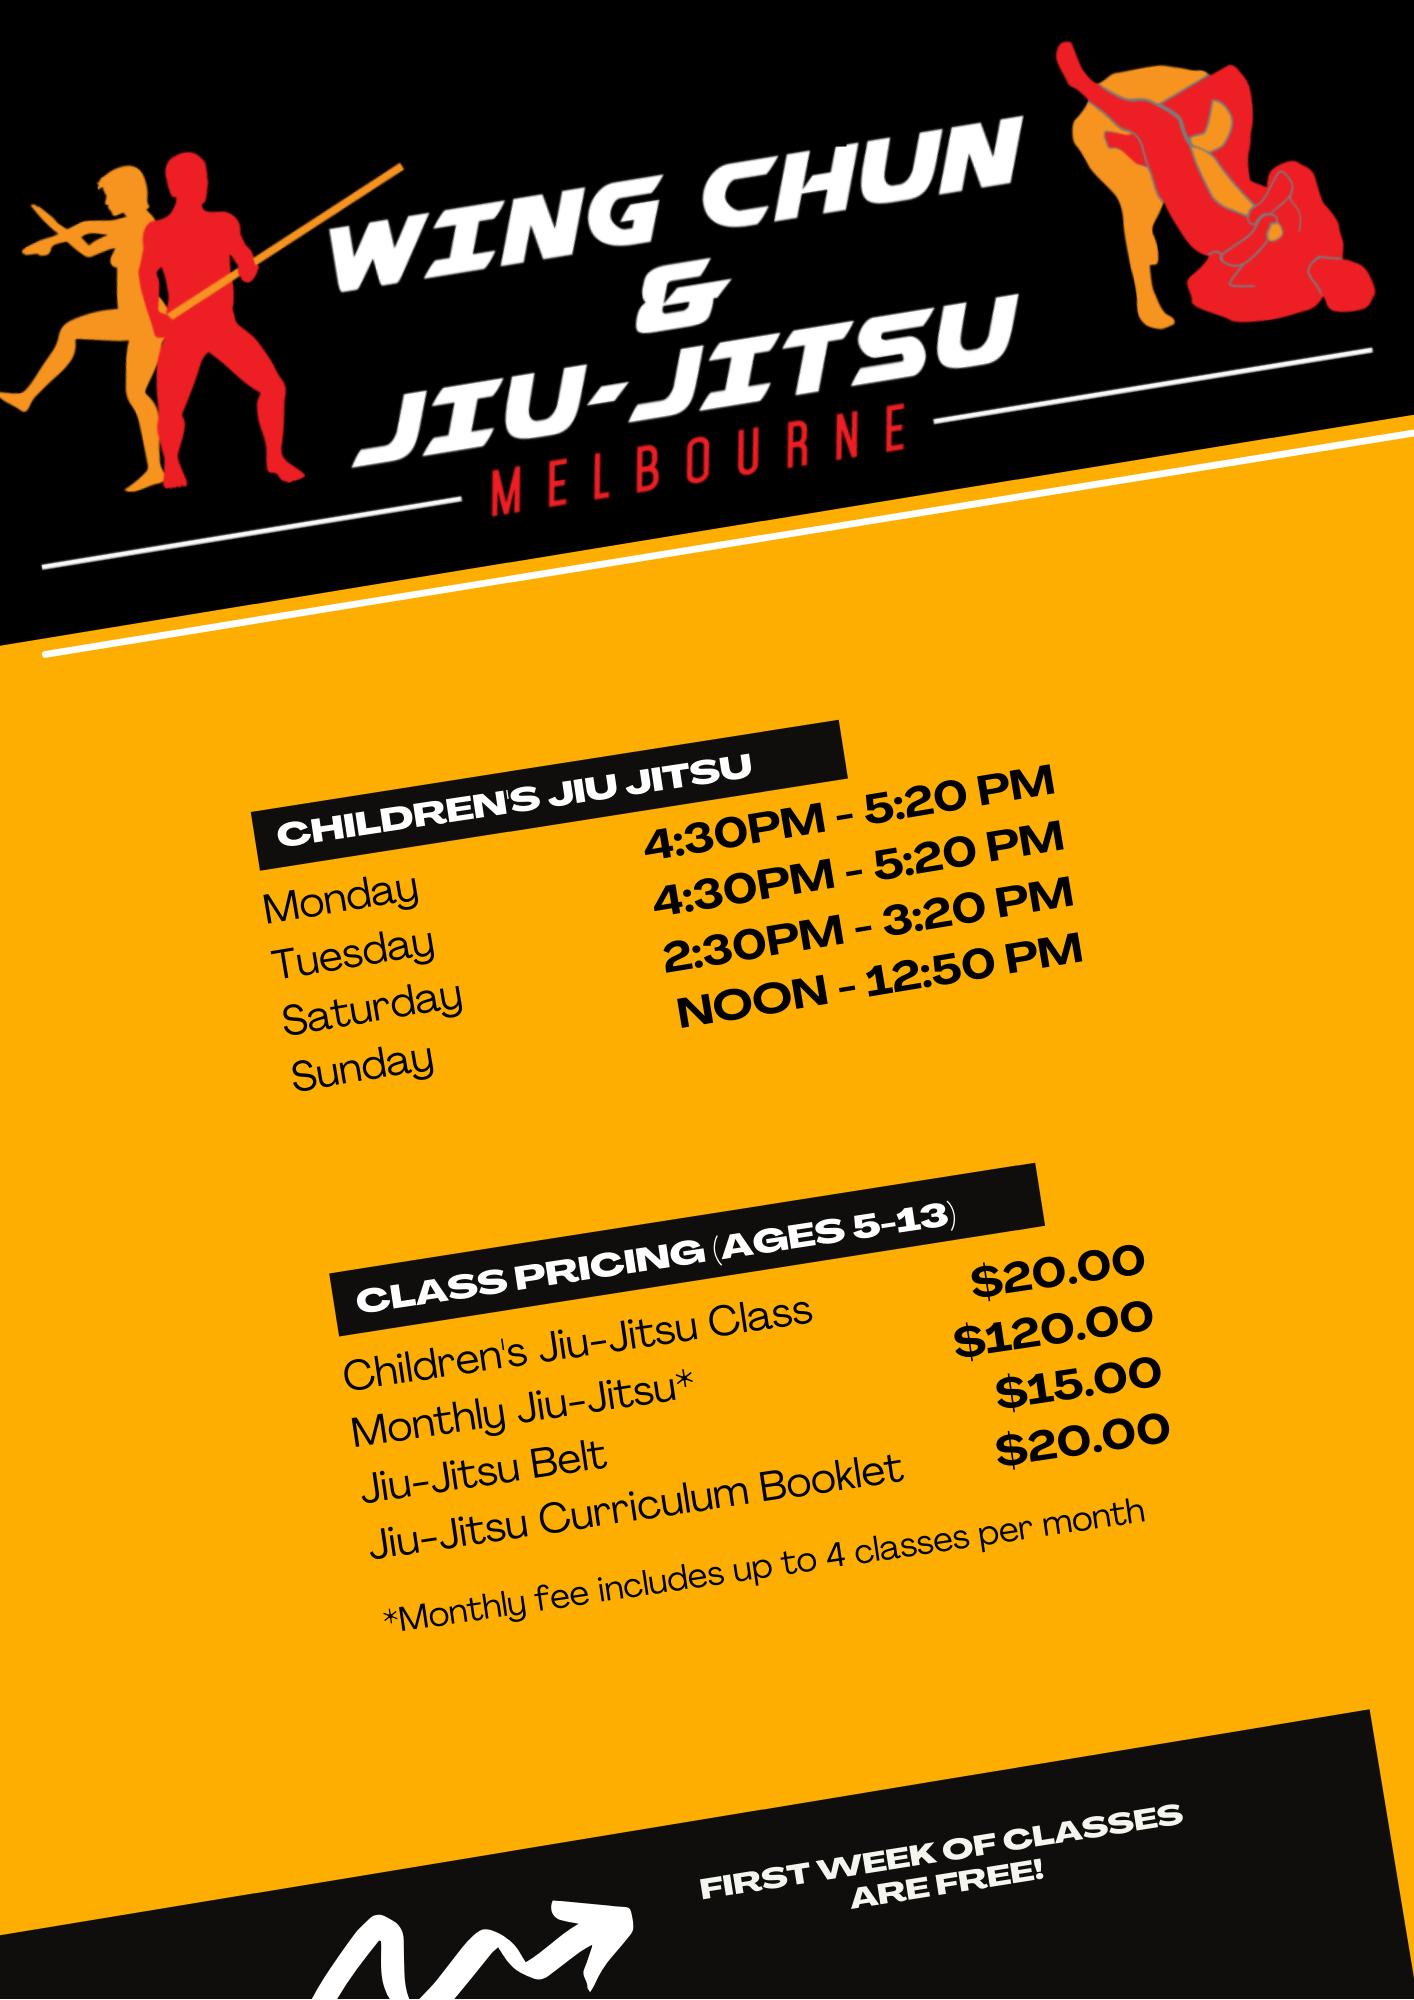 Wing Chun & Jiu-Jitsu Melbourne - Kids Karate Training Timetable 2021 KidsTimetable2021-2